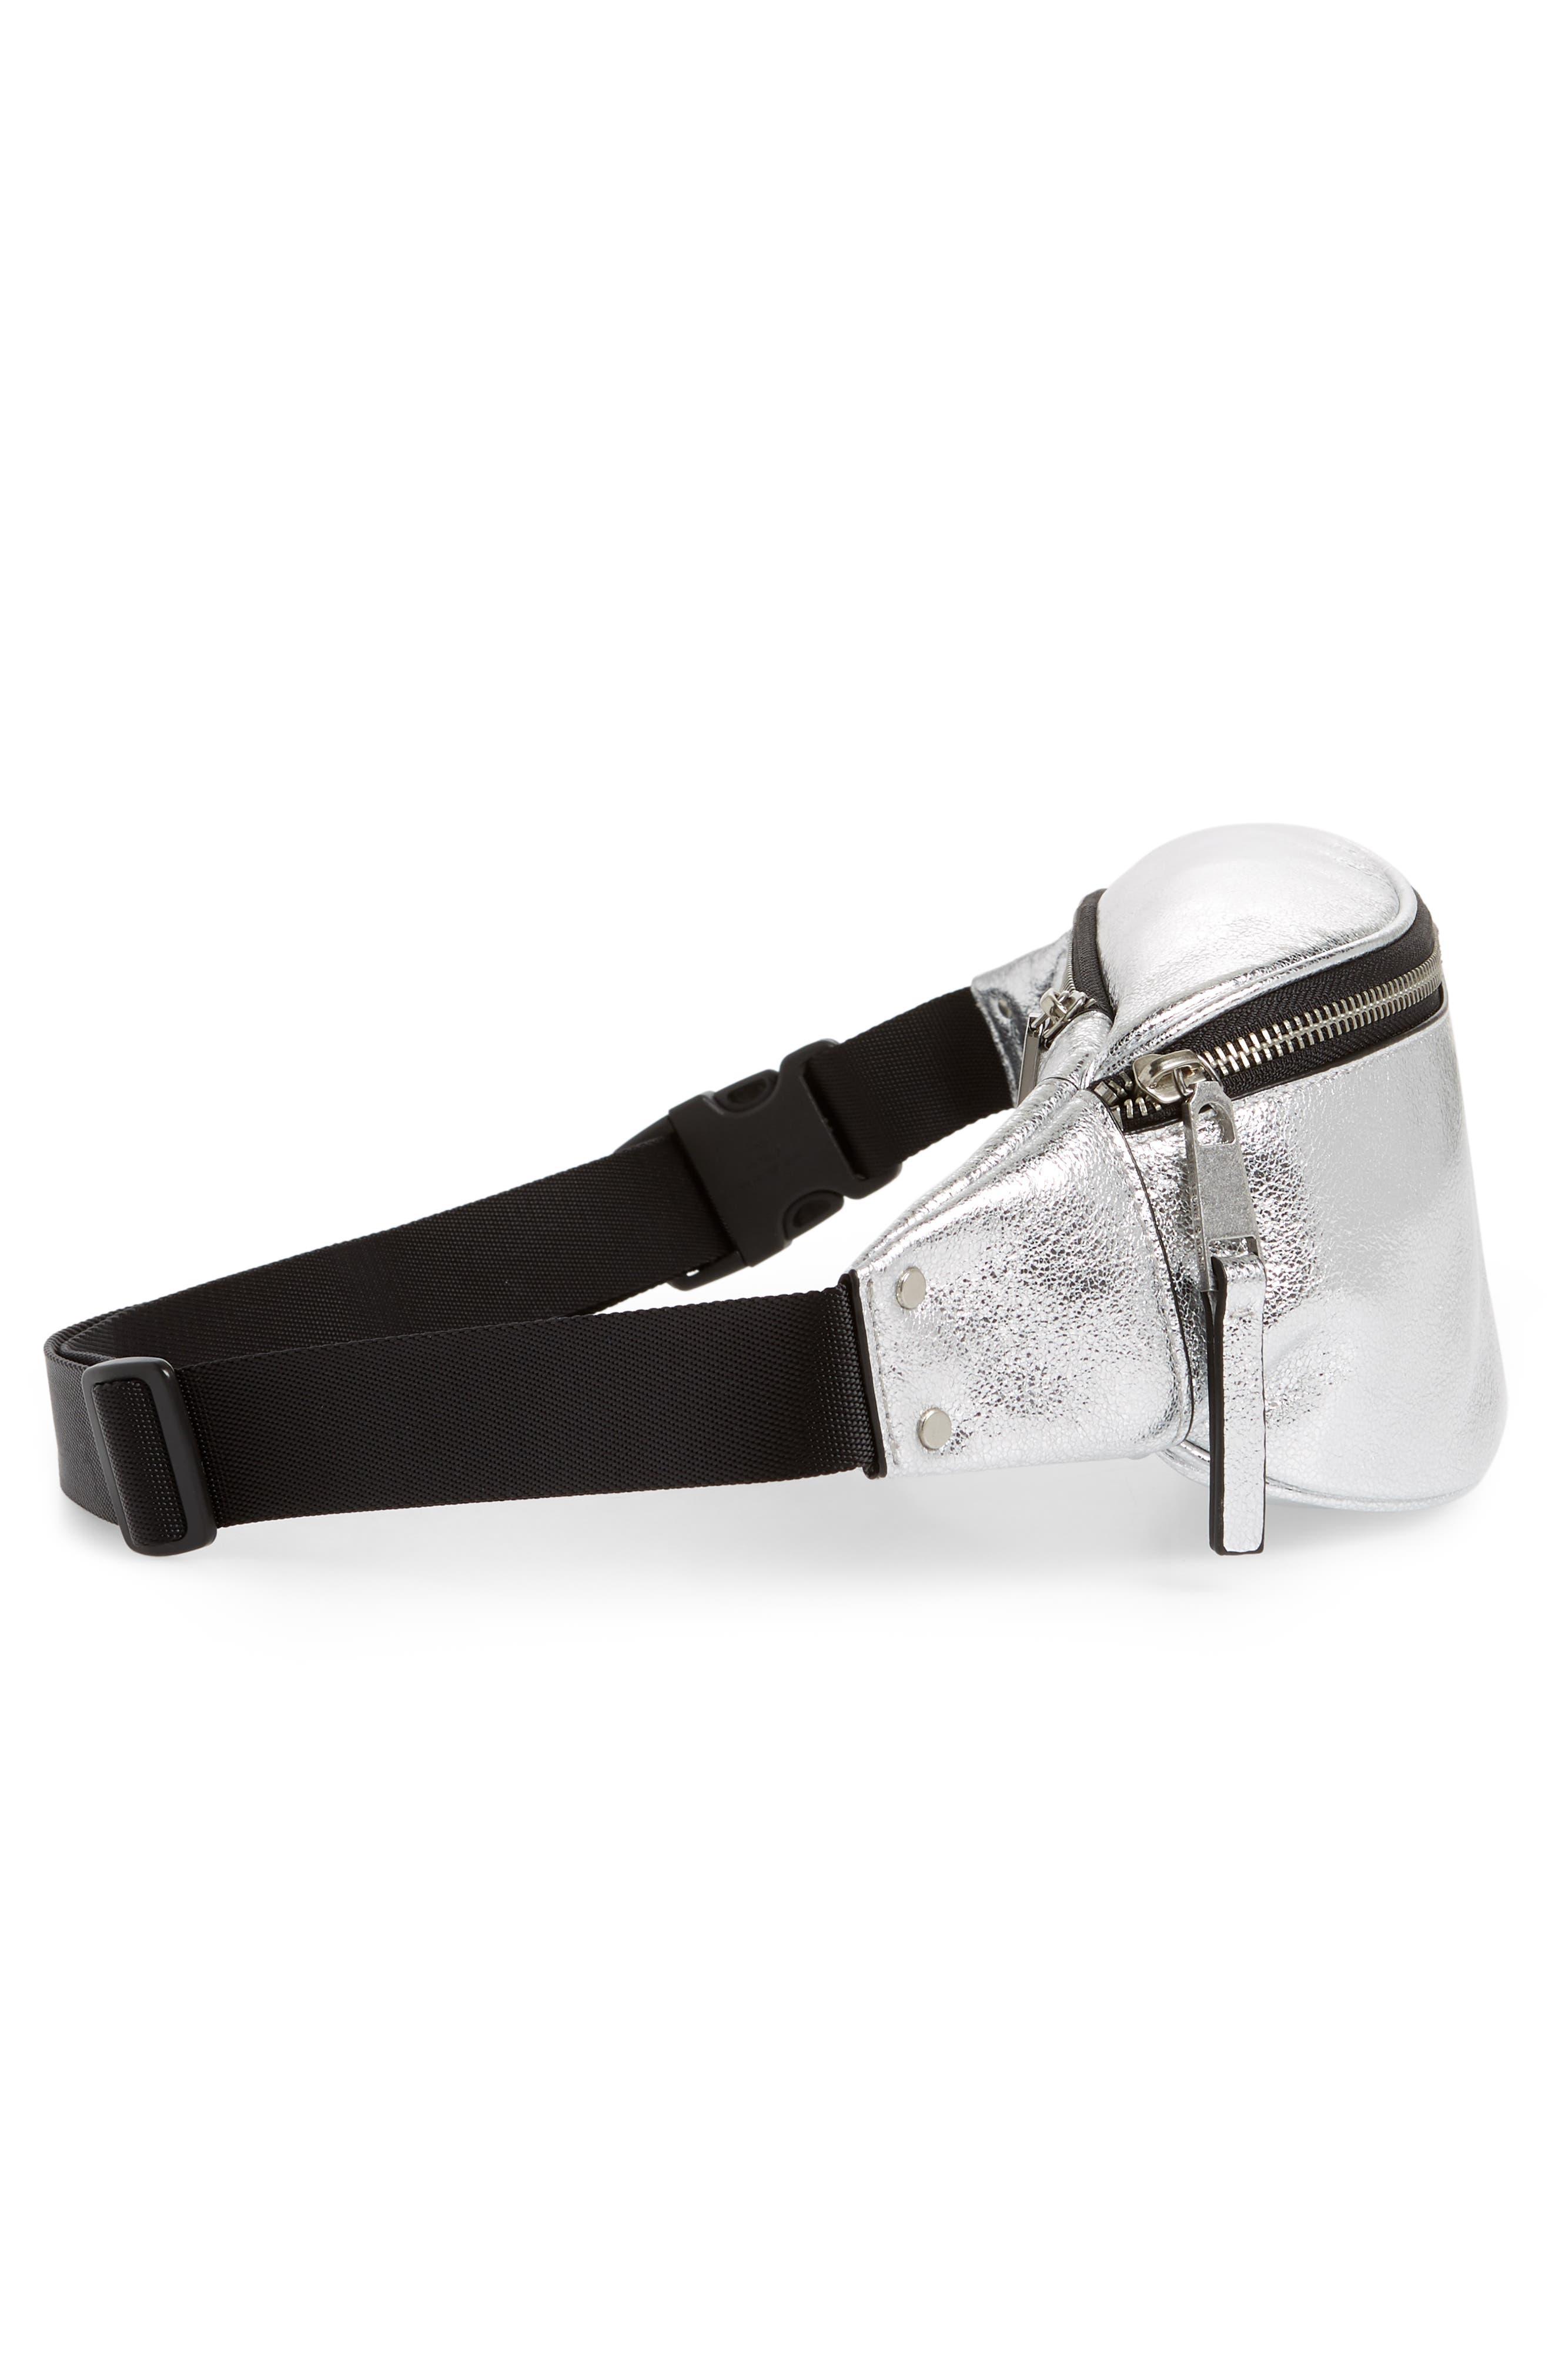 TREASURE & BOND,                             Mason Metallic Leather Belt Bag,                             Alternate thumbnail 6, color,                             SILVER